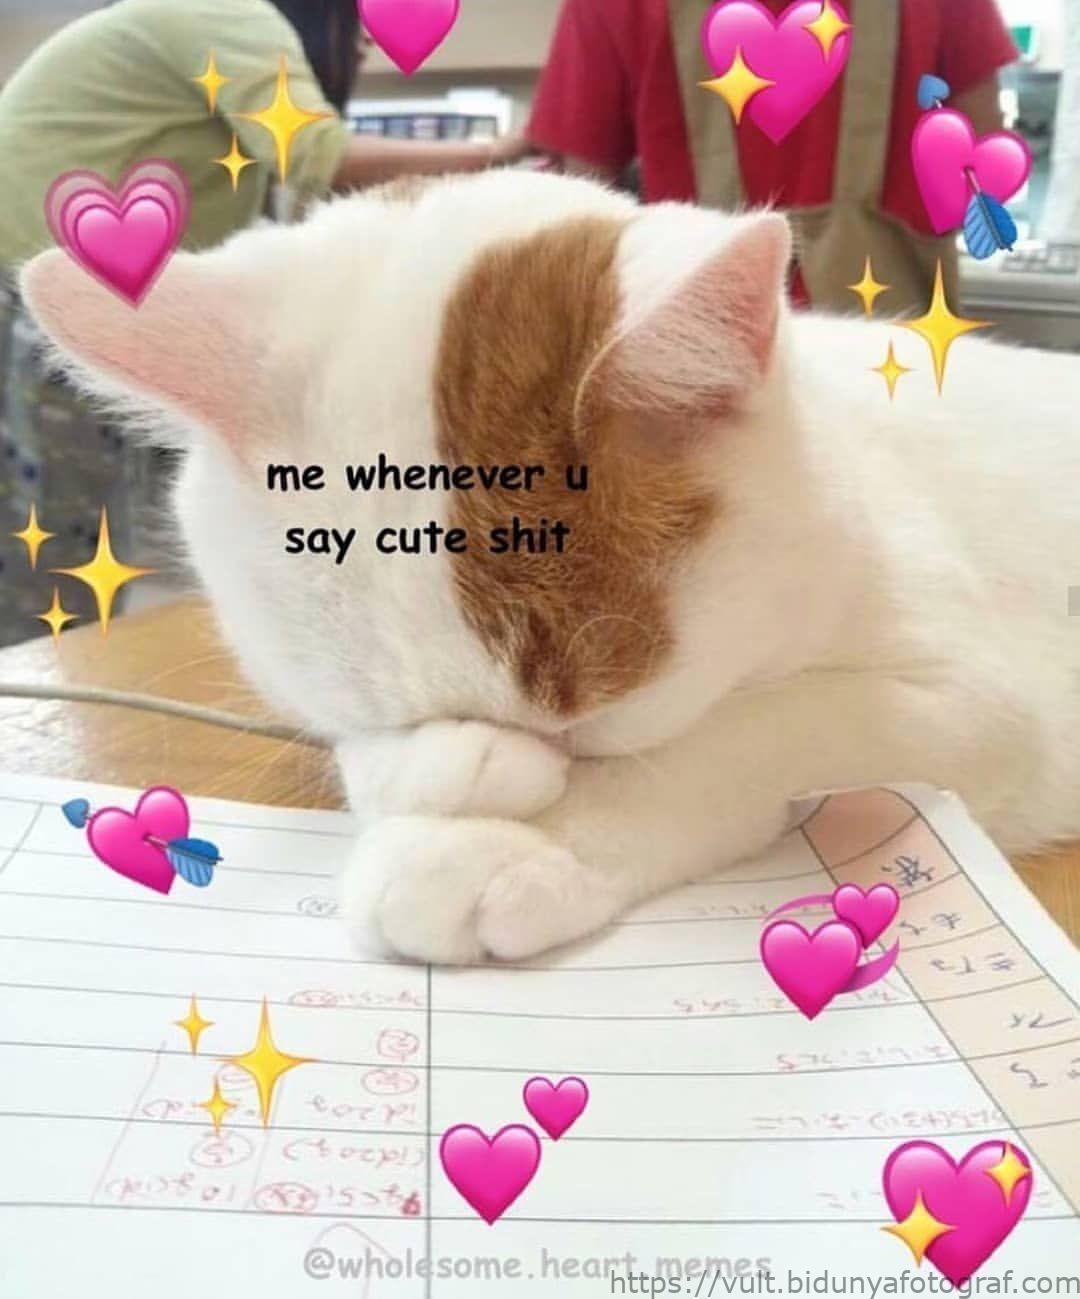 Memes Saludables En Instagram Etiqueta A Alguien Speci Alguien Instagram Memes Memesdeanimalesamor Memesdeani Love You Meme Cute Love Memes Cute Memes